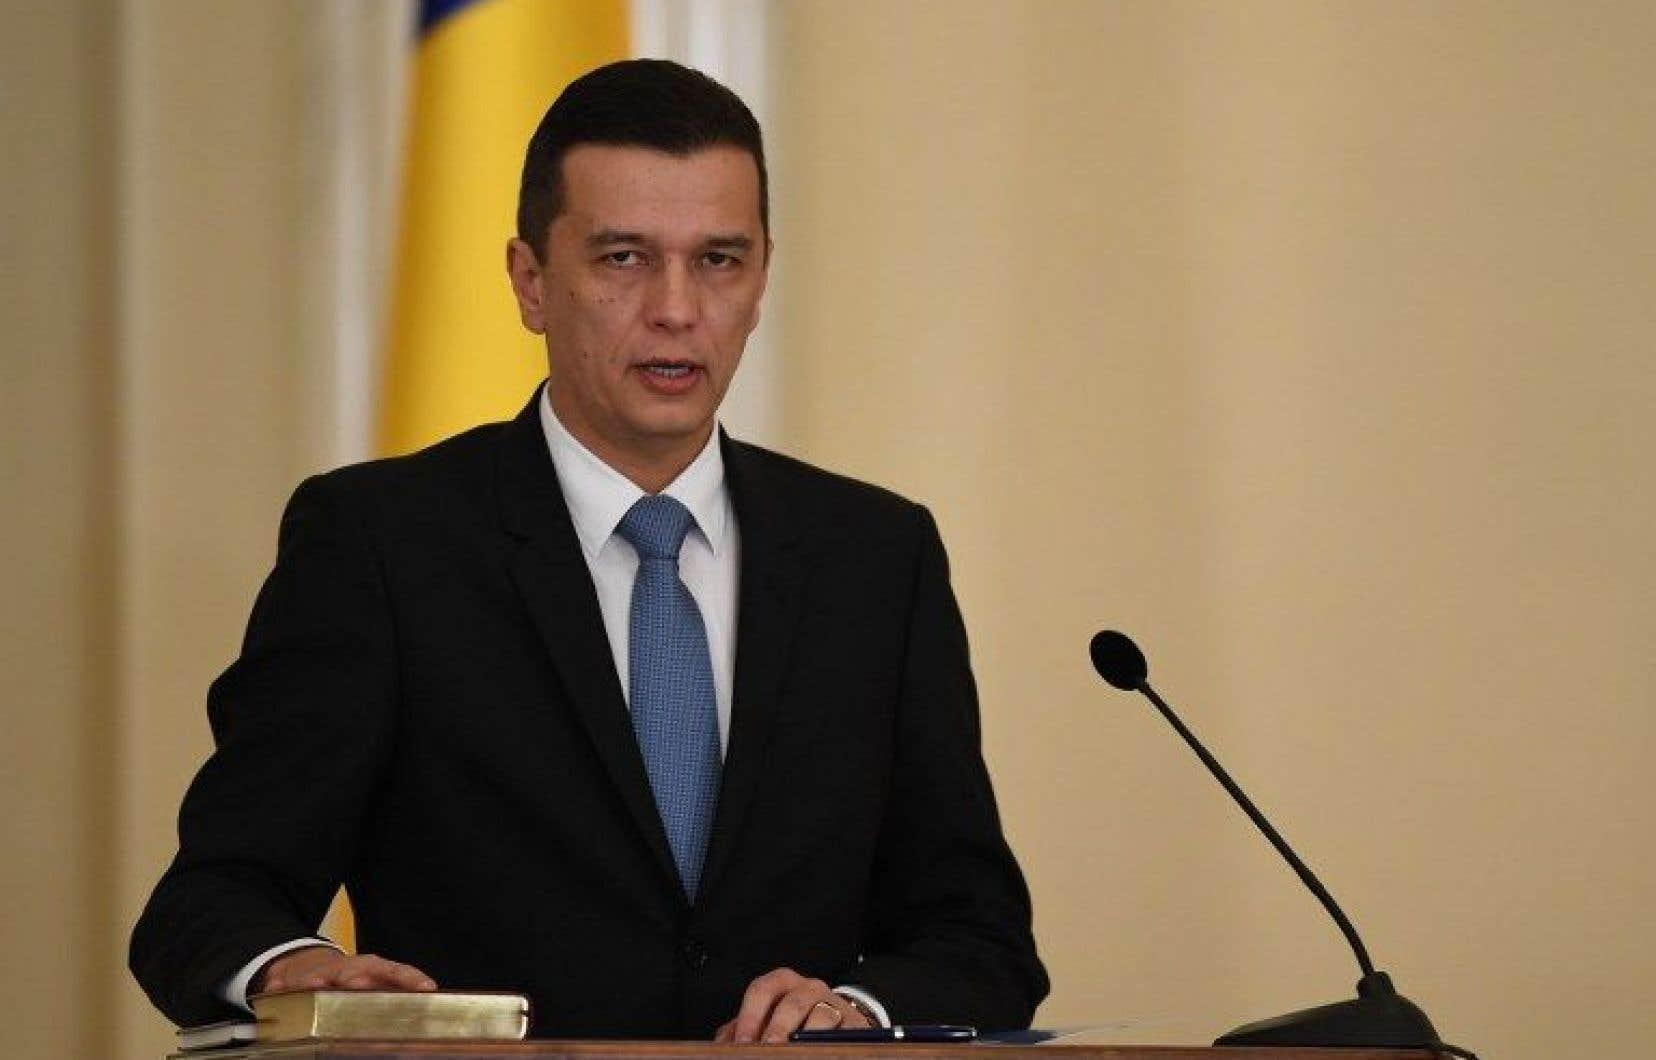 Le premier ministre roumain, Sorin Grindeanu